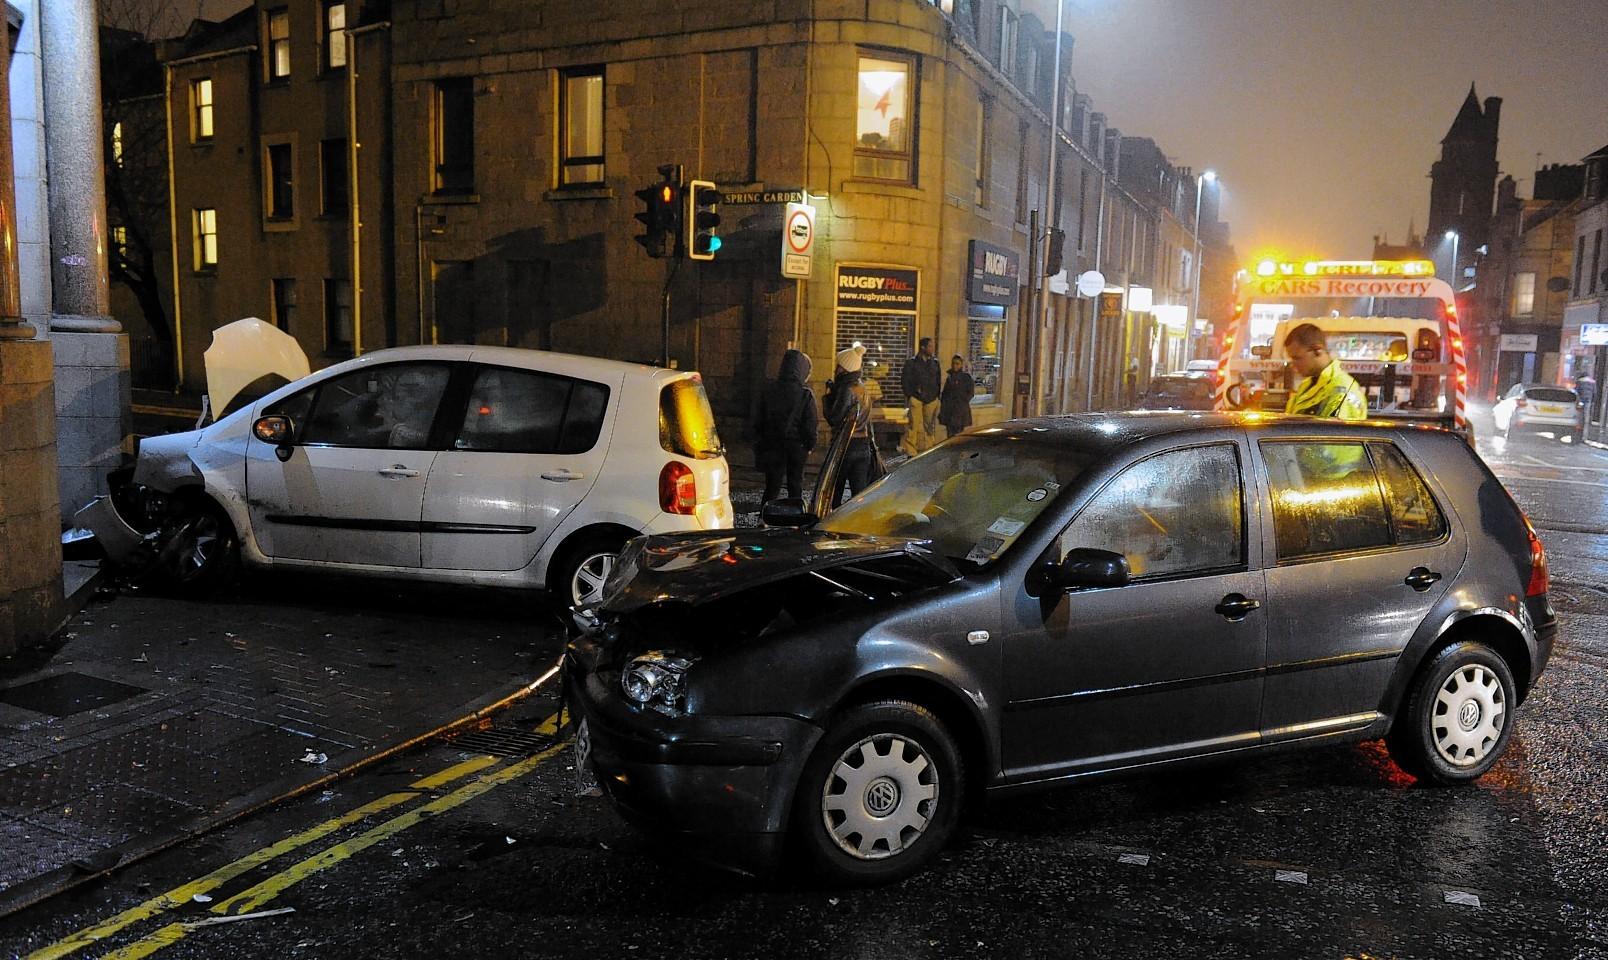 This evening's crash on George Street